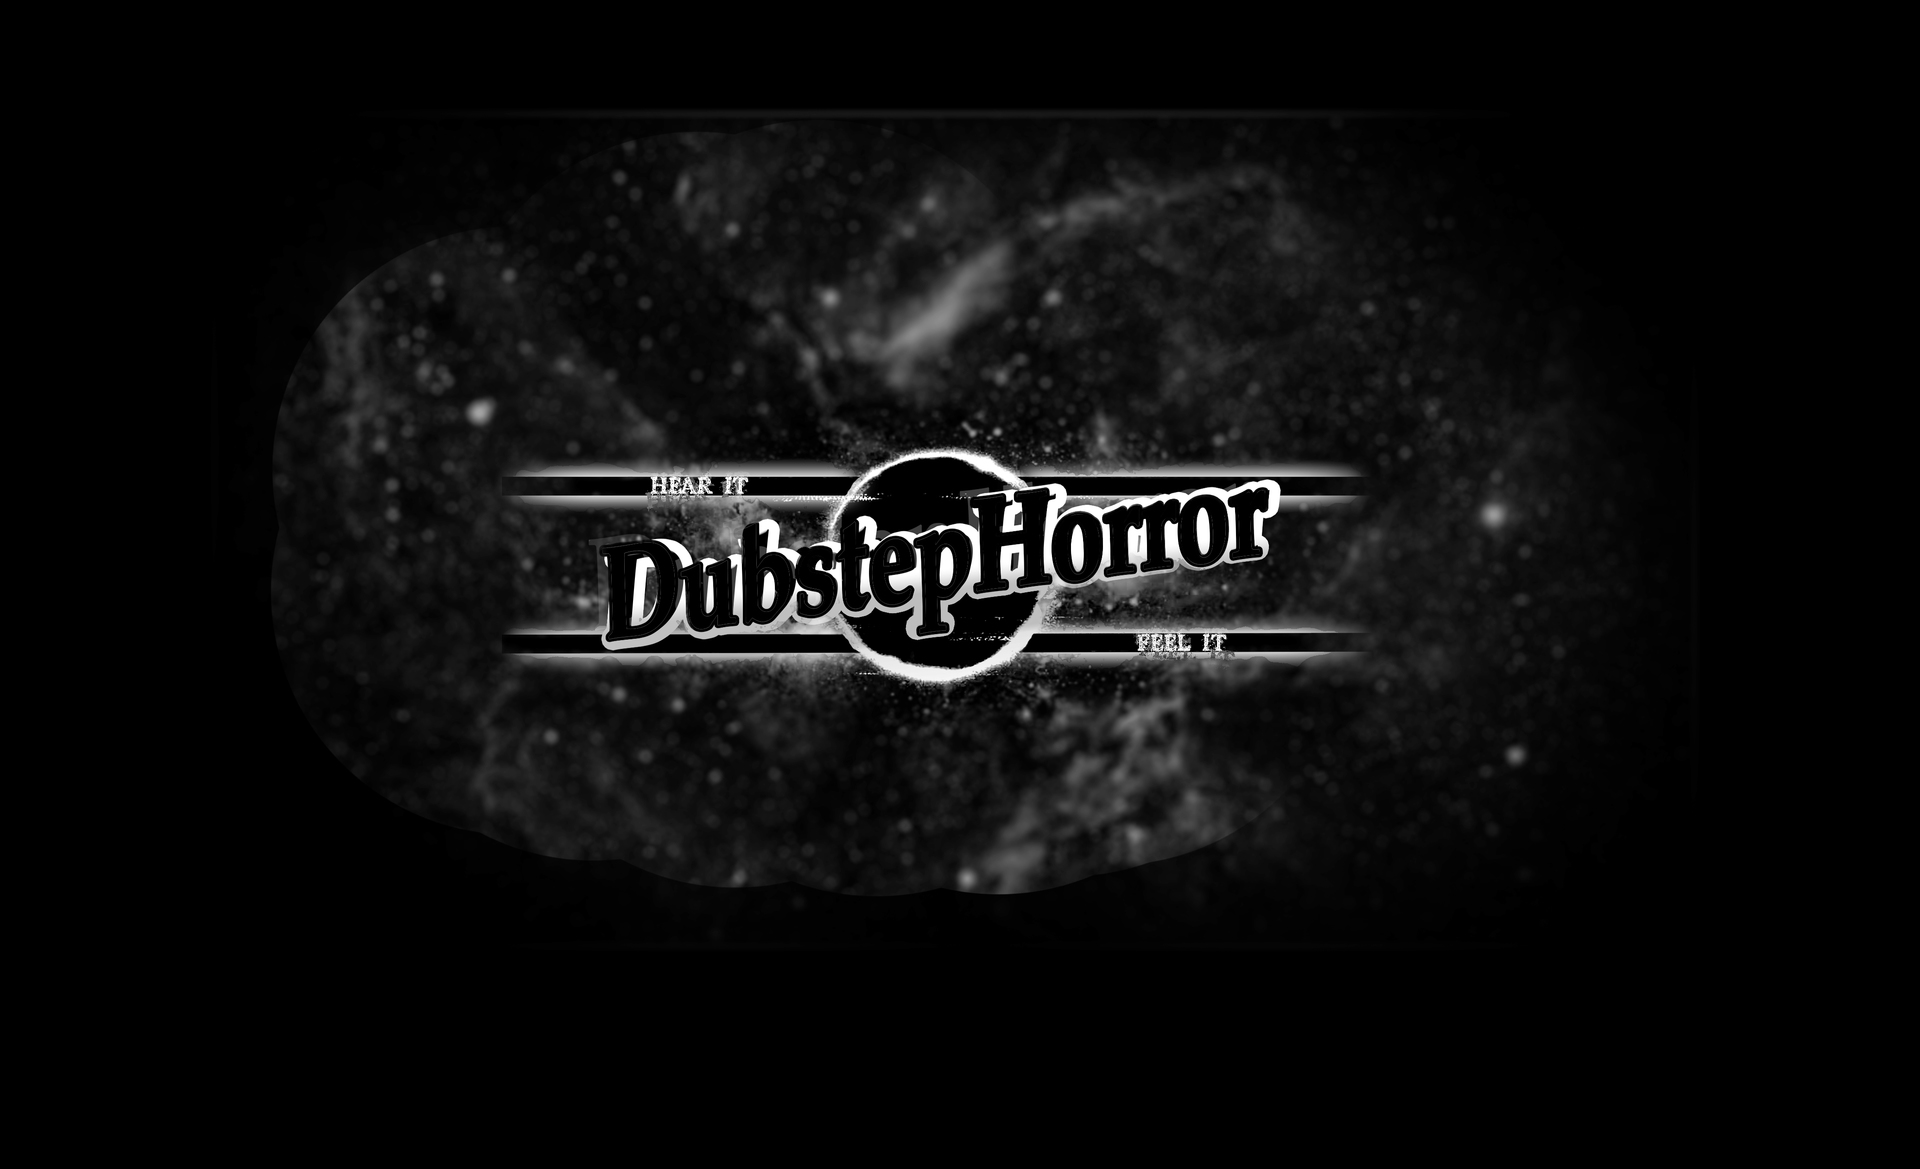 DubstepHorror Store